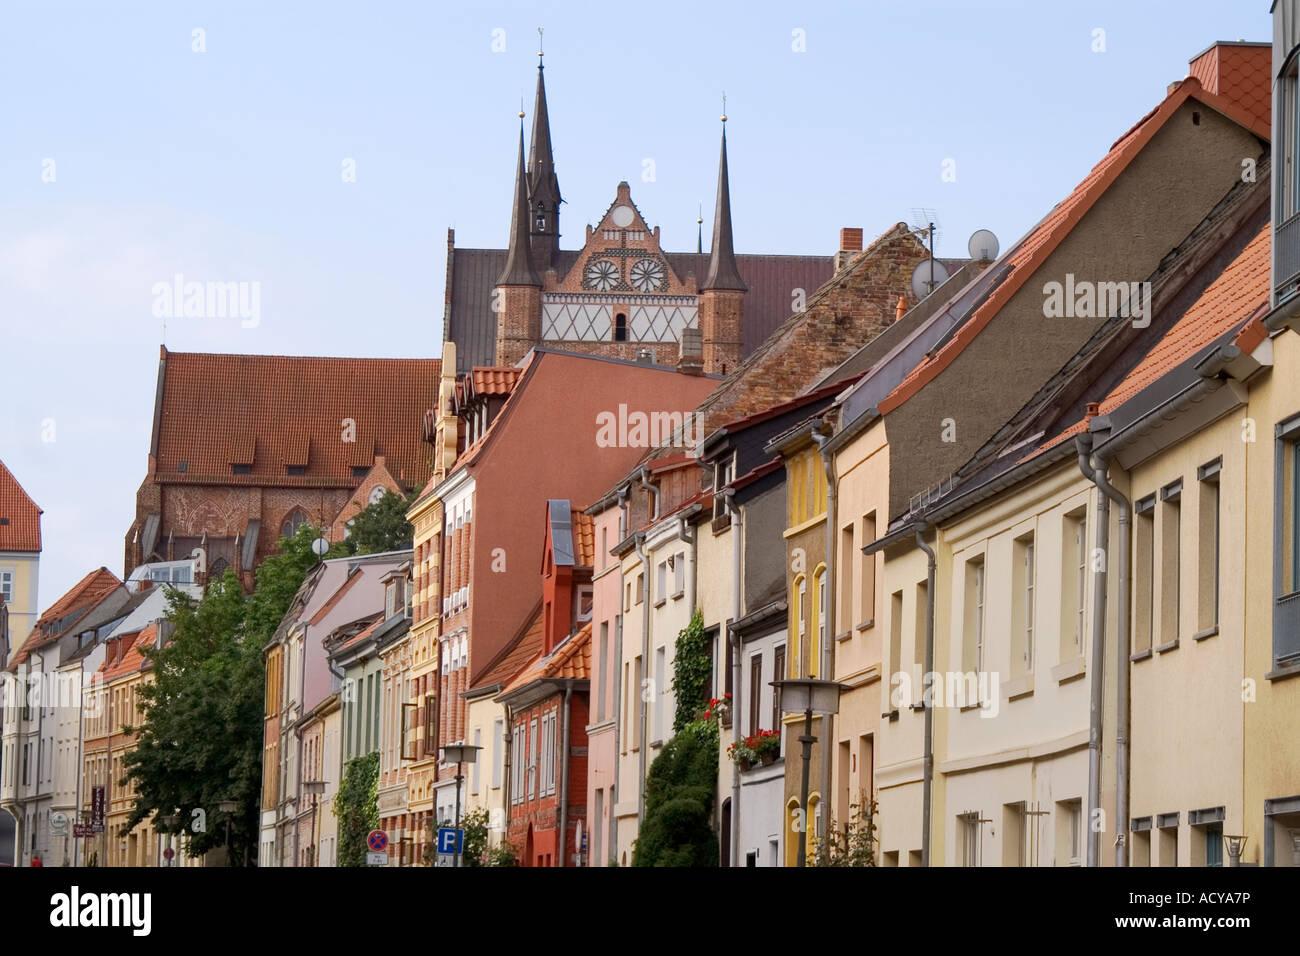 Wismar, city scene with Georgen church, Germany - Stock Image